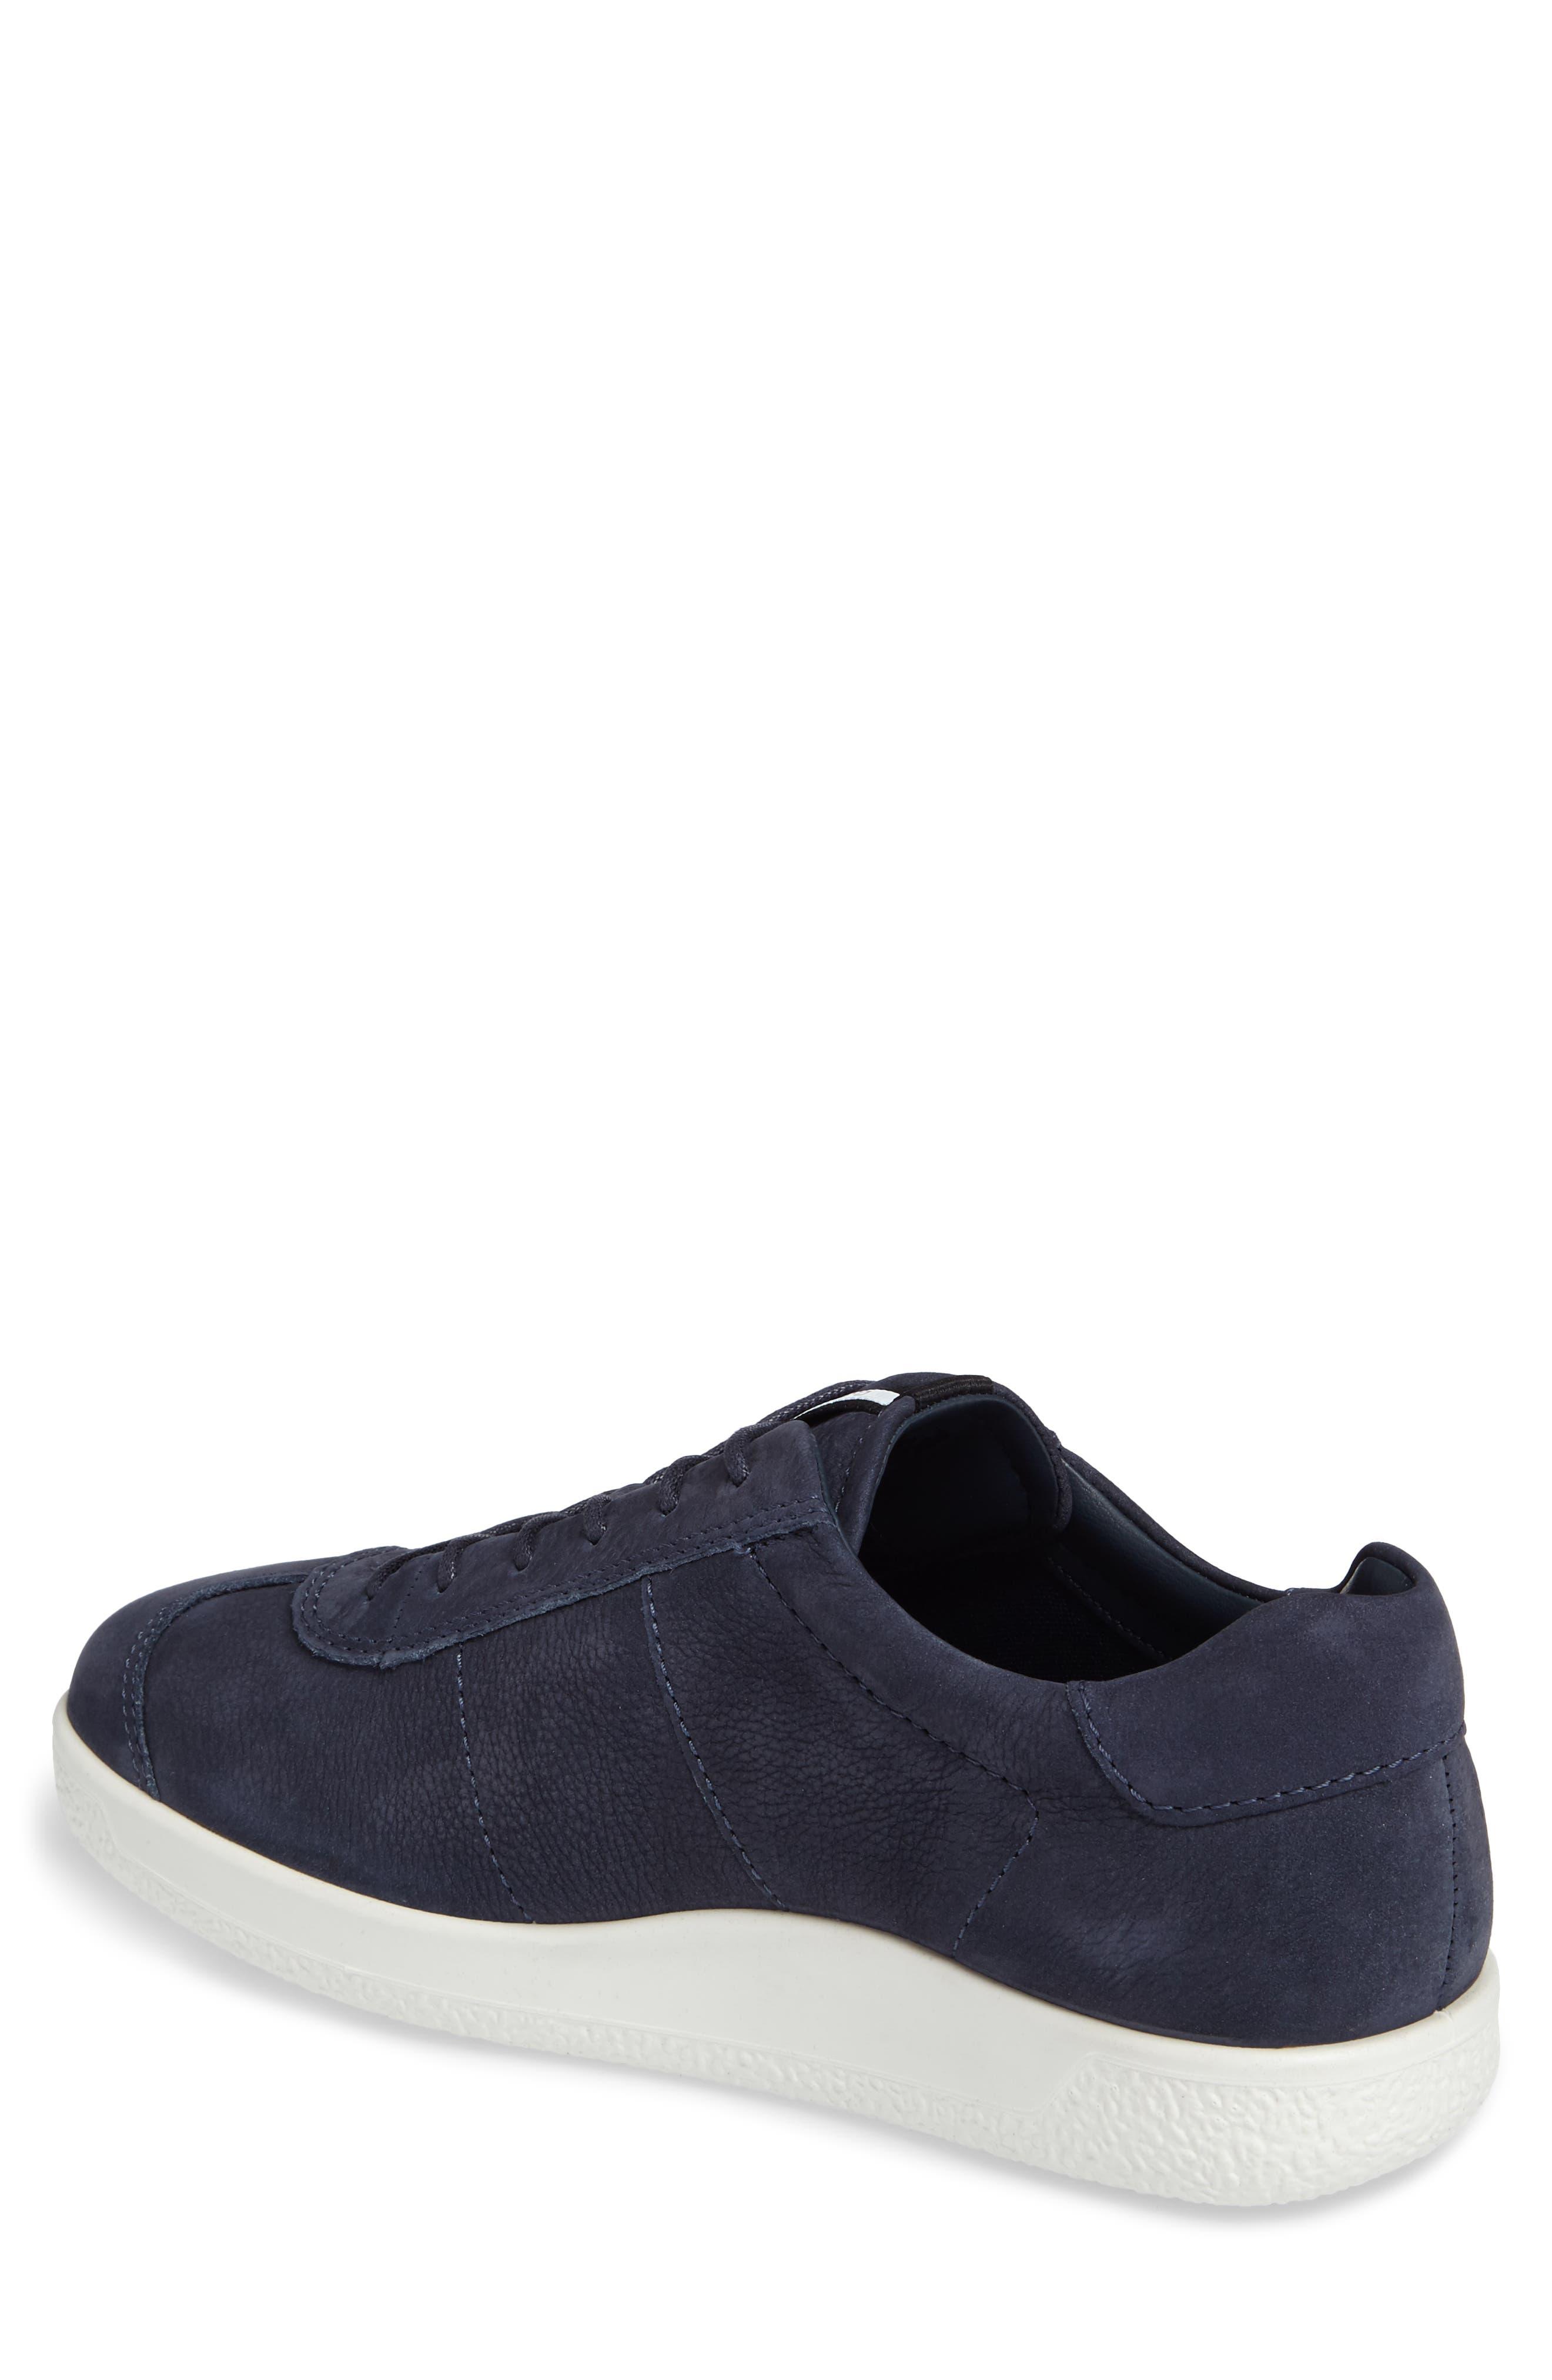 Soft 1 Sneaker,                             Alternate thumbnail 2, color,                             Marine Nubuck